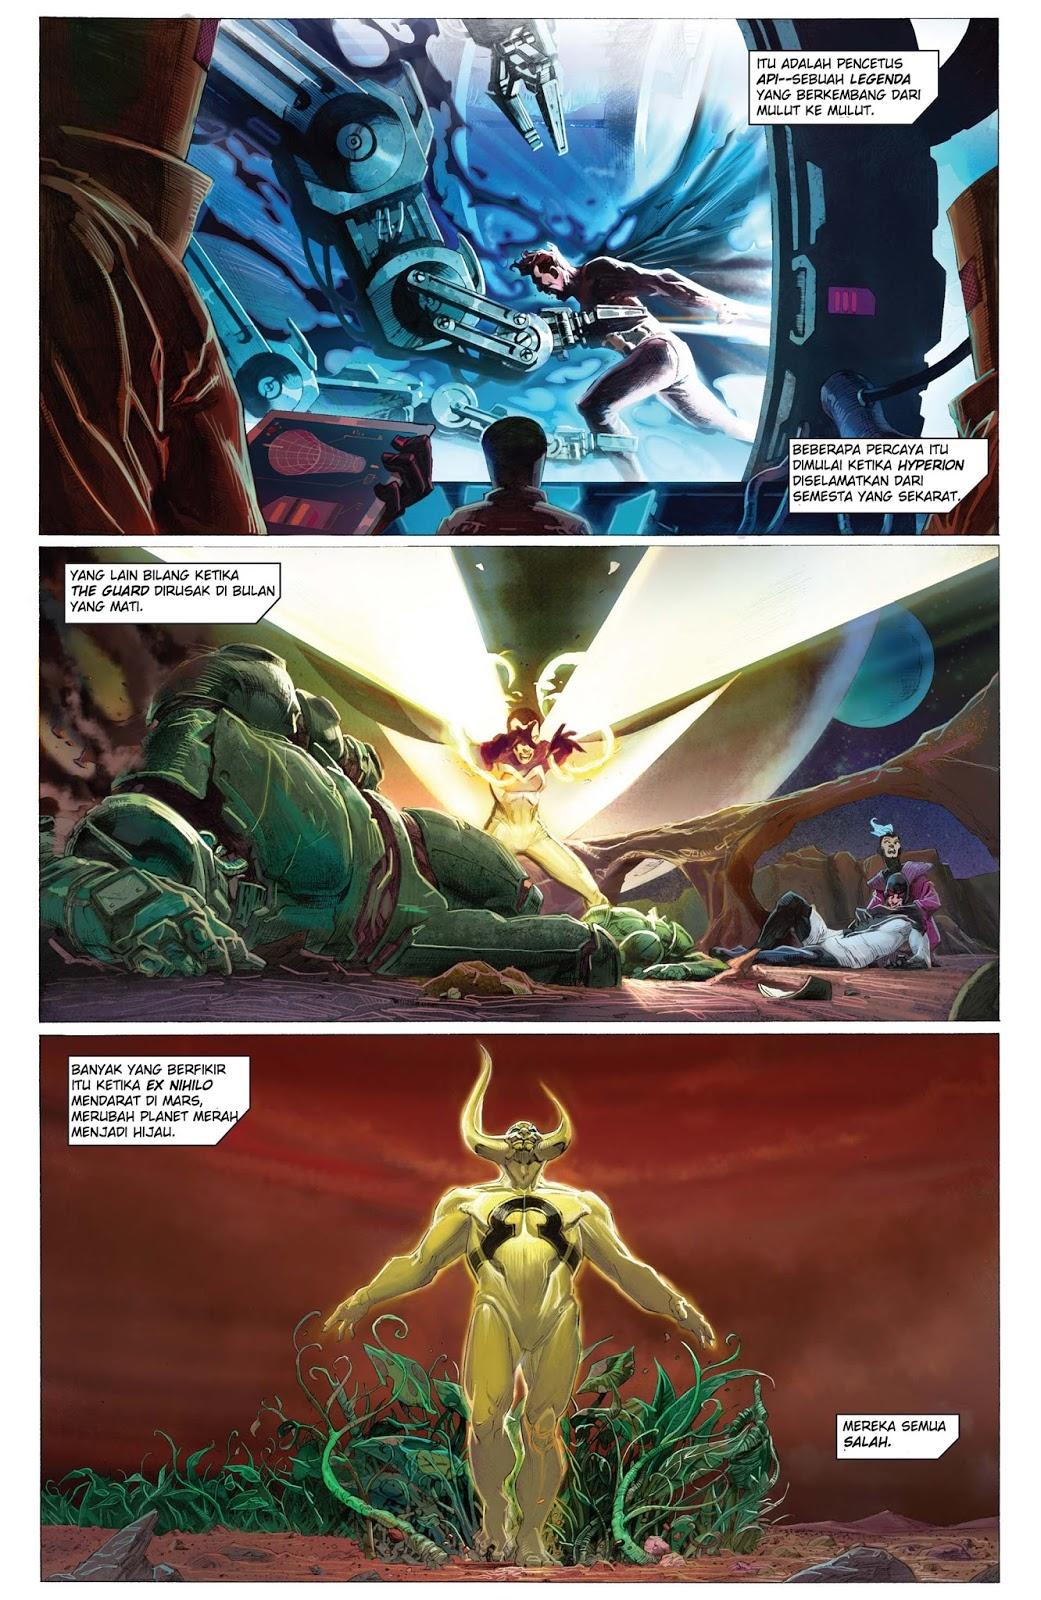 komik the avengers #1 (2012) - komik pos - baca komik